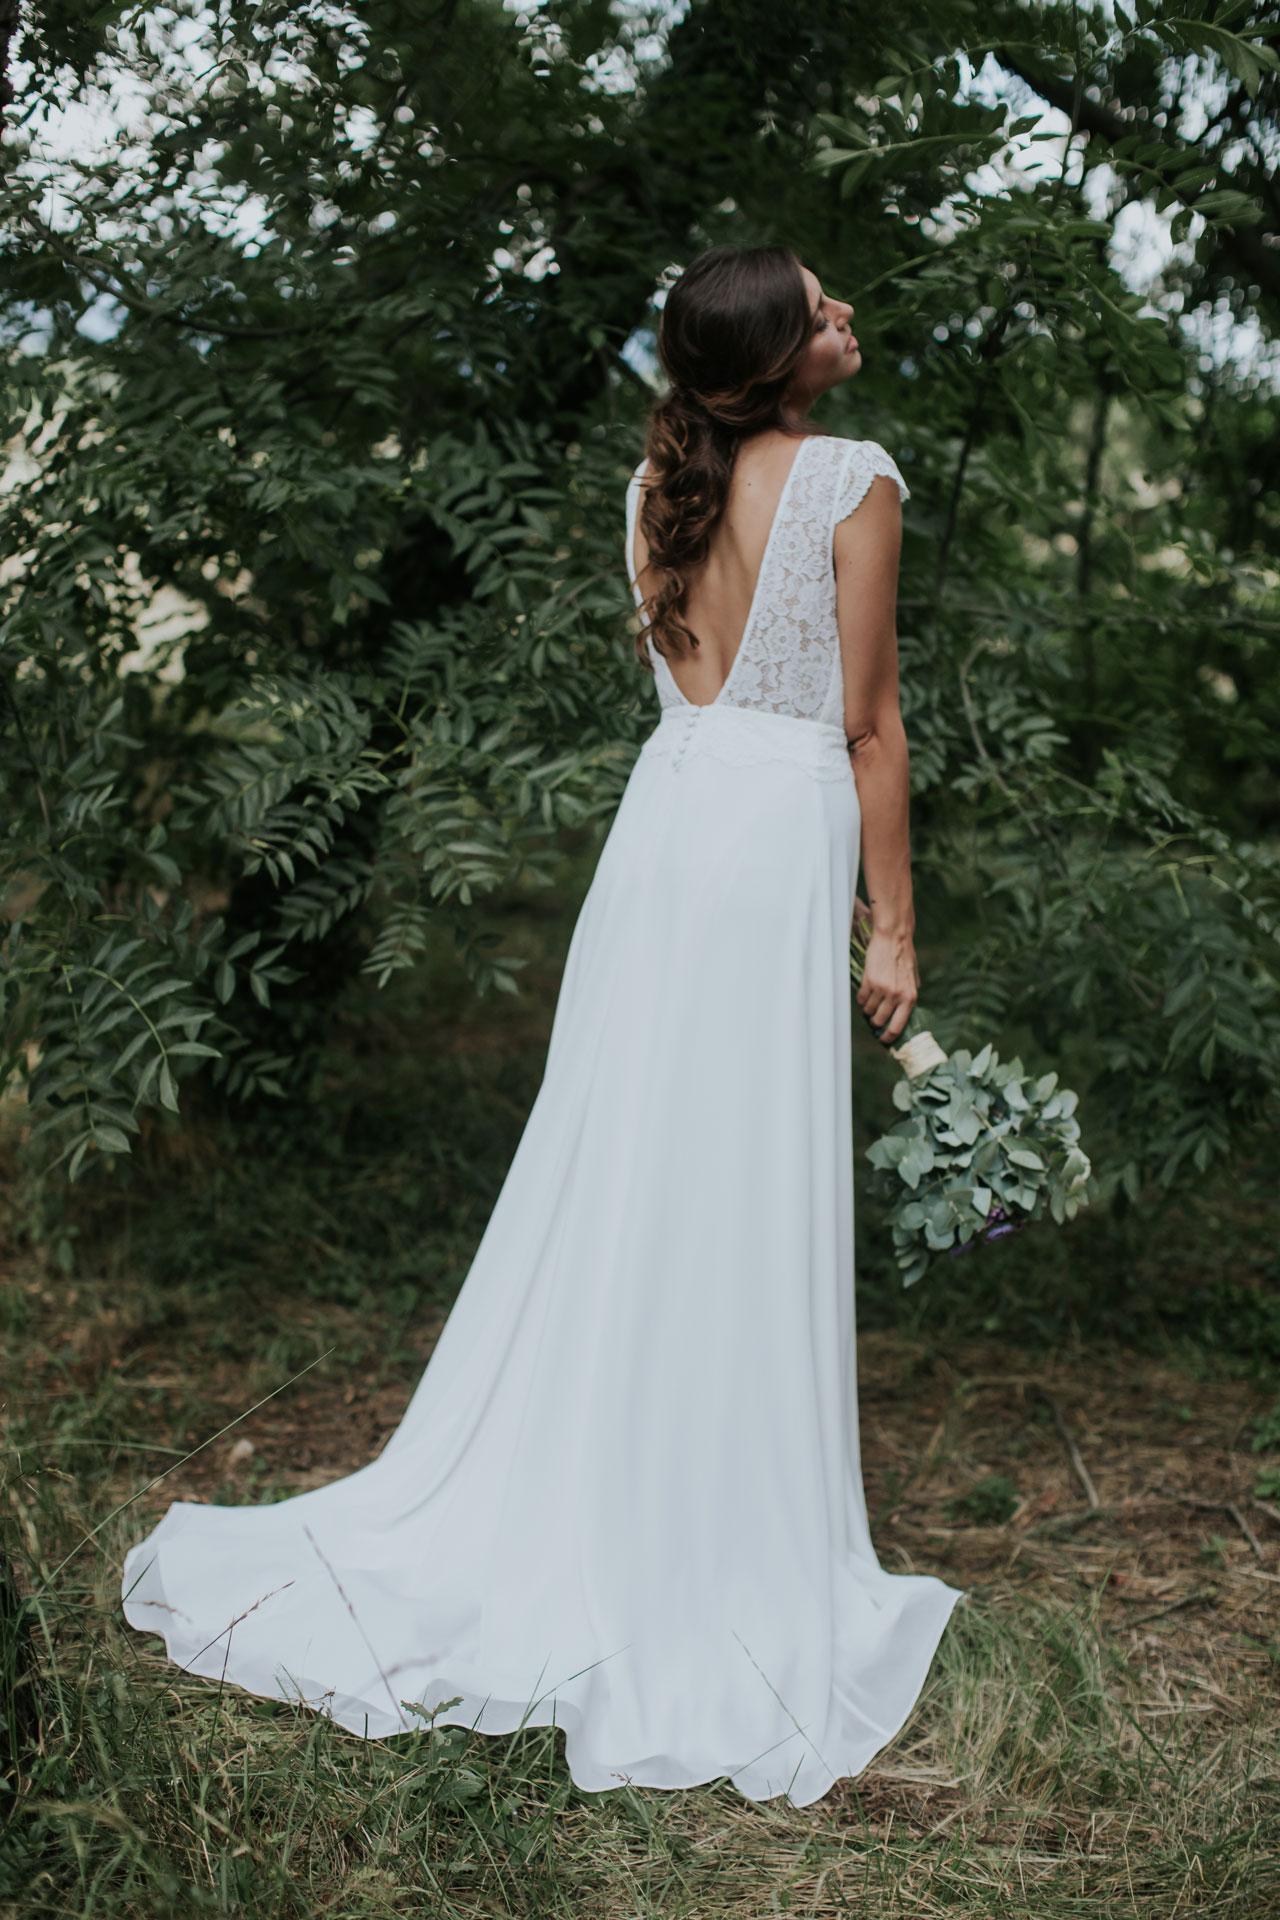 Vestido de novia Rosa / L'AVETIS